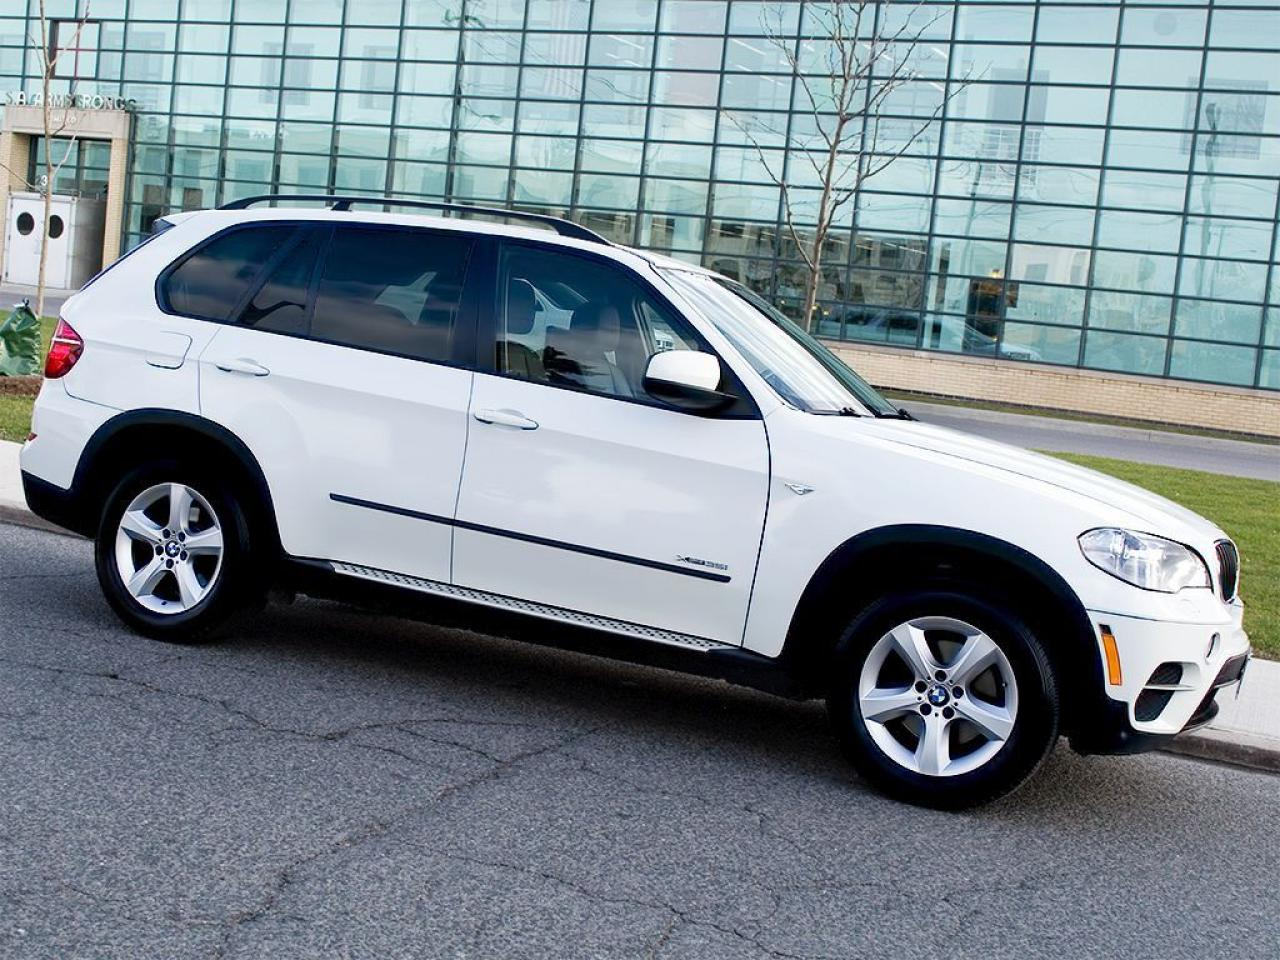 2012 BMW X5 35i|7 SEATS|NAVI|REARCAM|DUAL DVD|PANOROOF